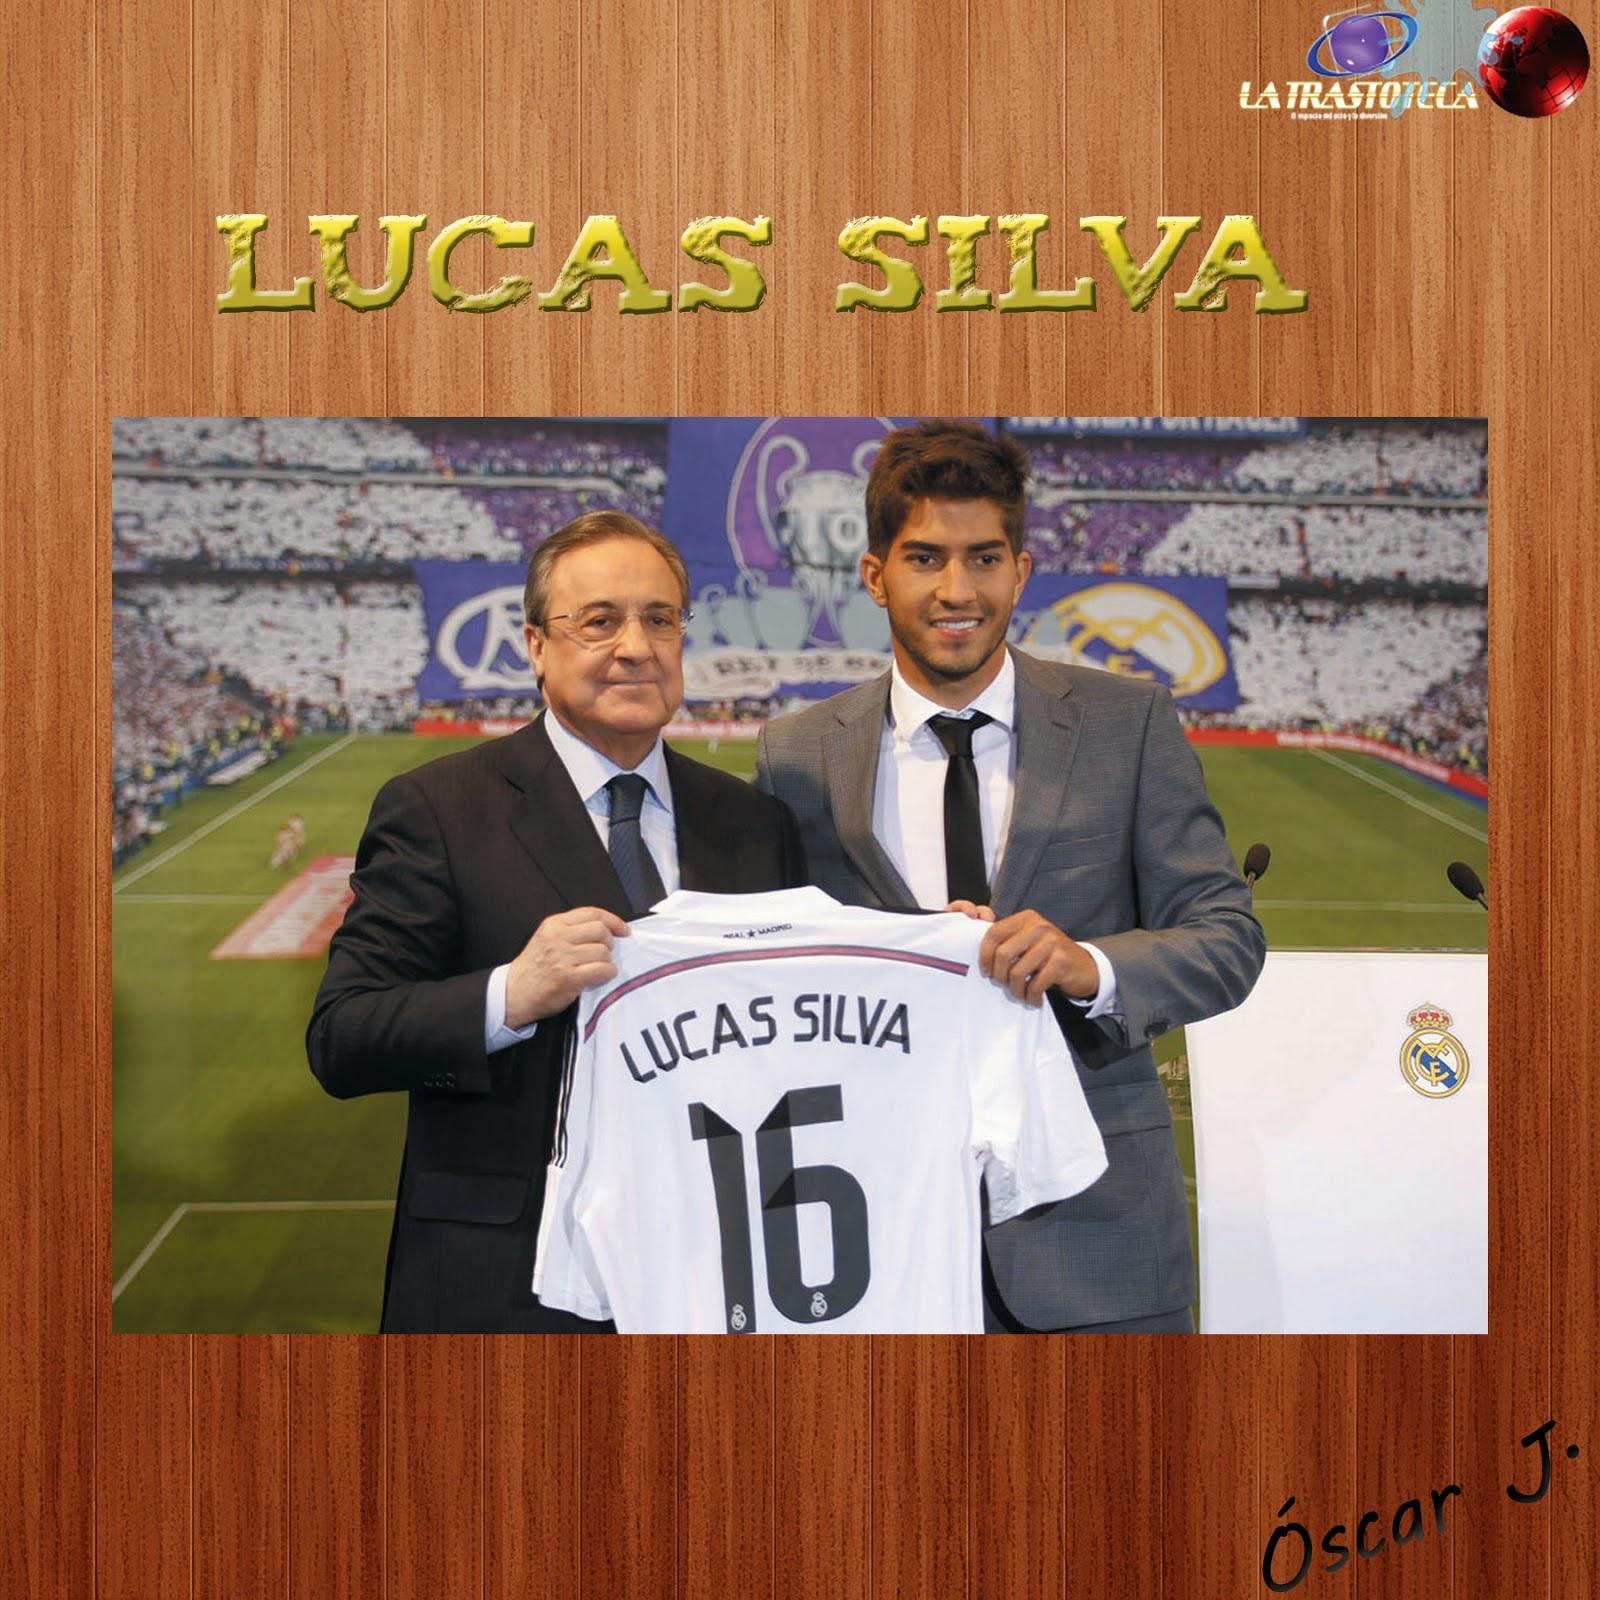 Lucas Silva nuevo fichaje del Real Madrid.